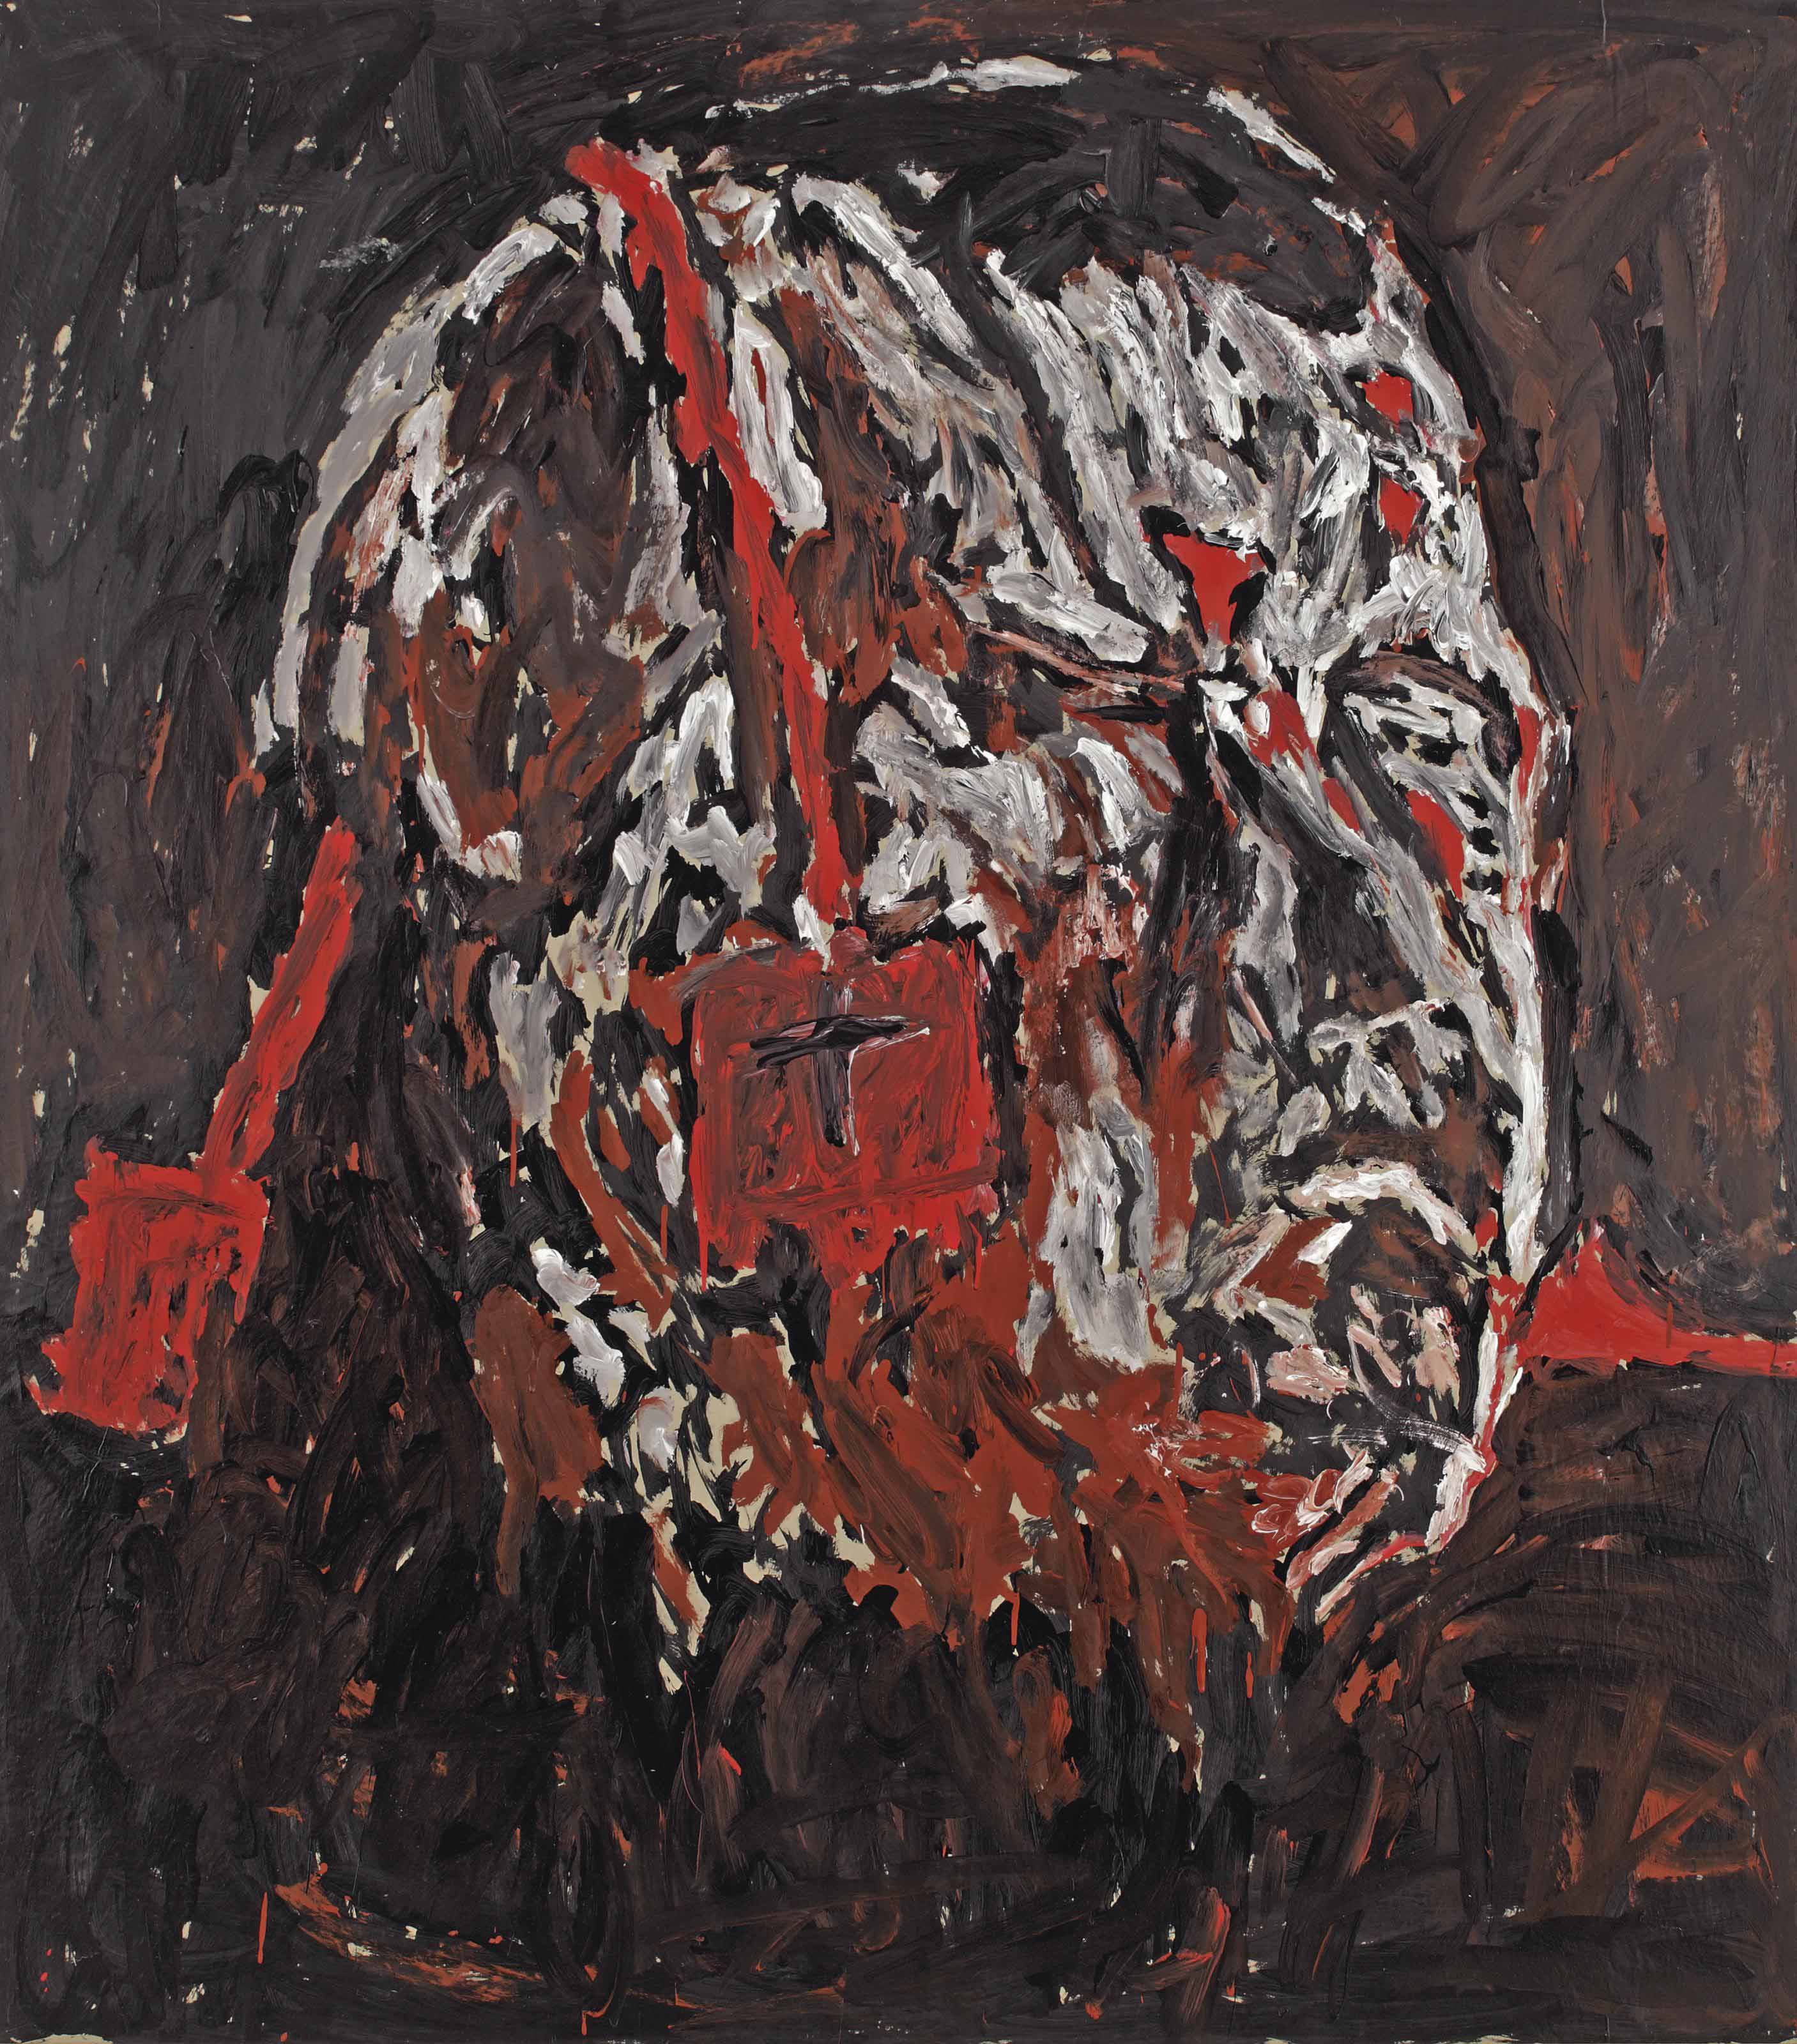 Hans Peter Adamski (b. 1947)